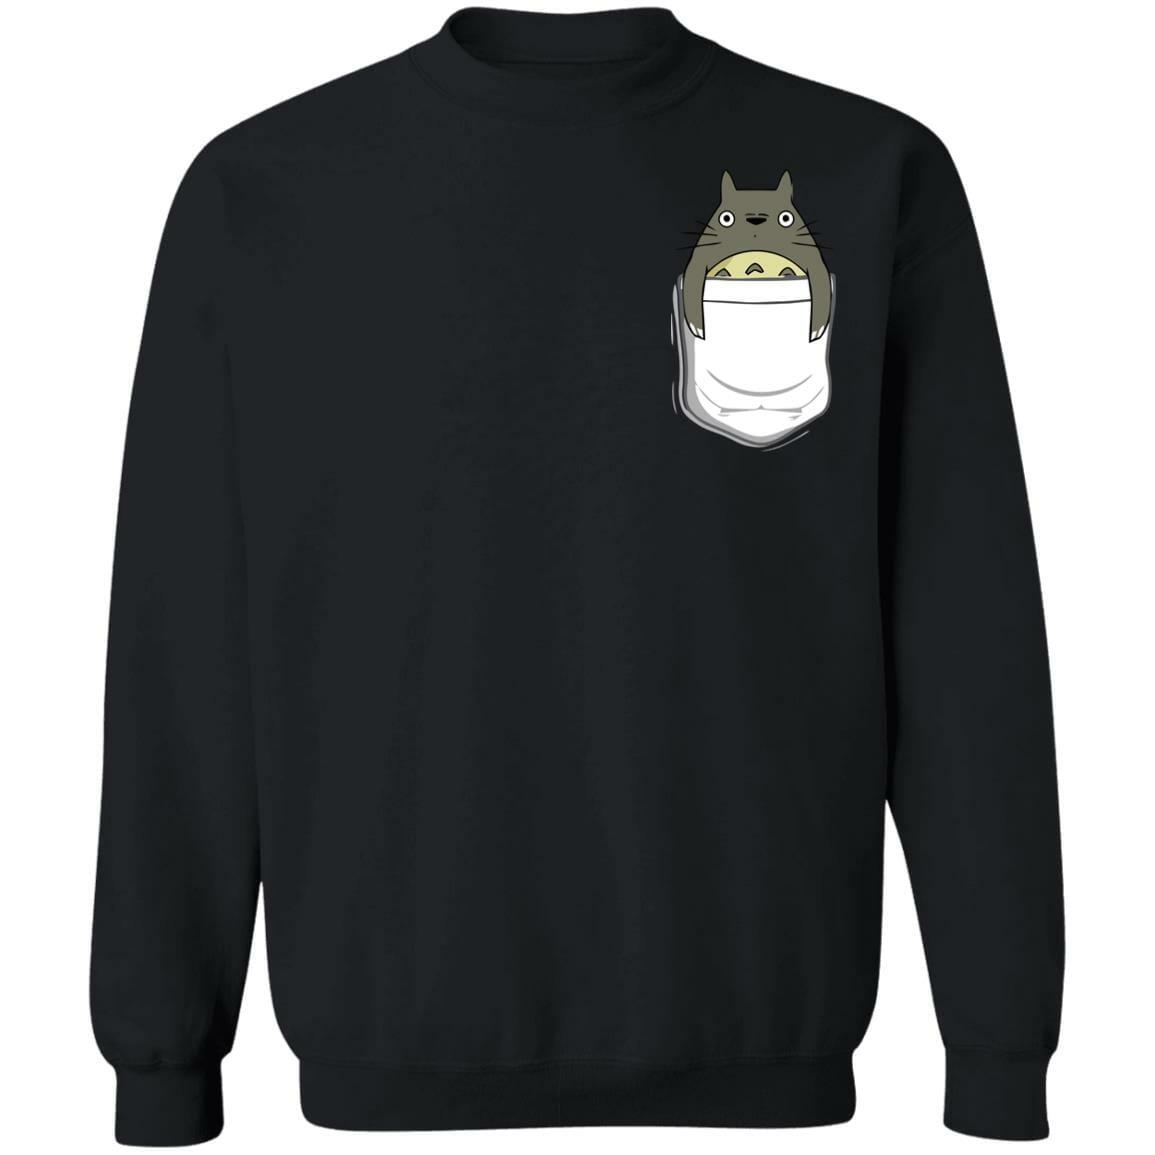 Totoro in Pocket Sweatshirt